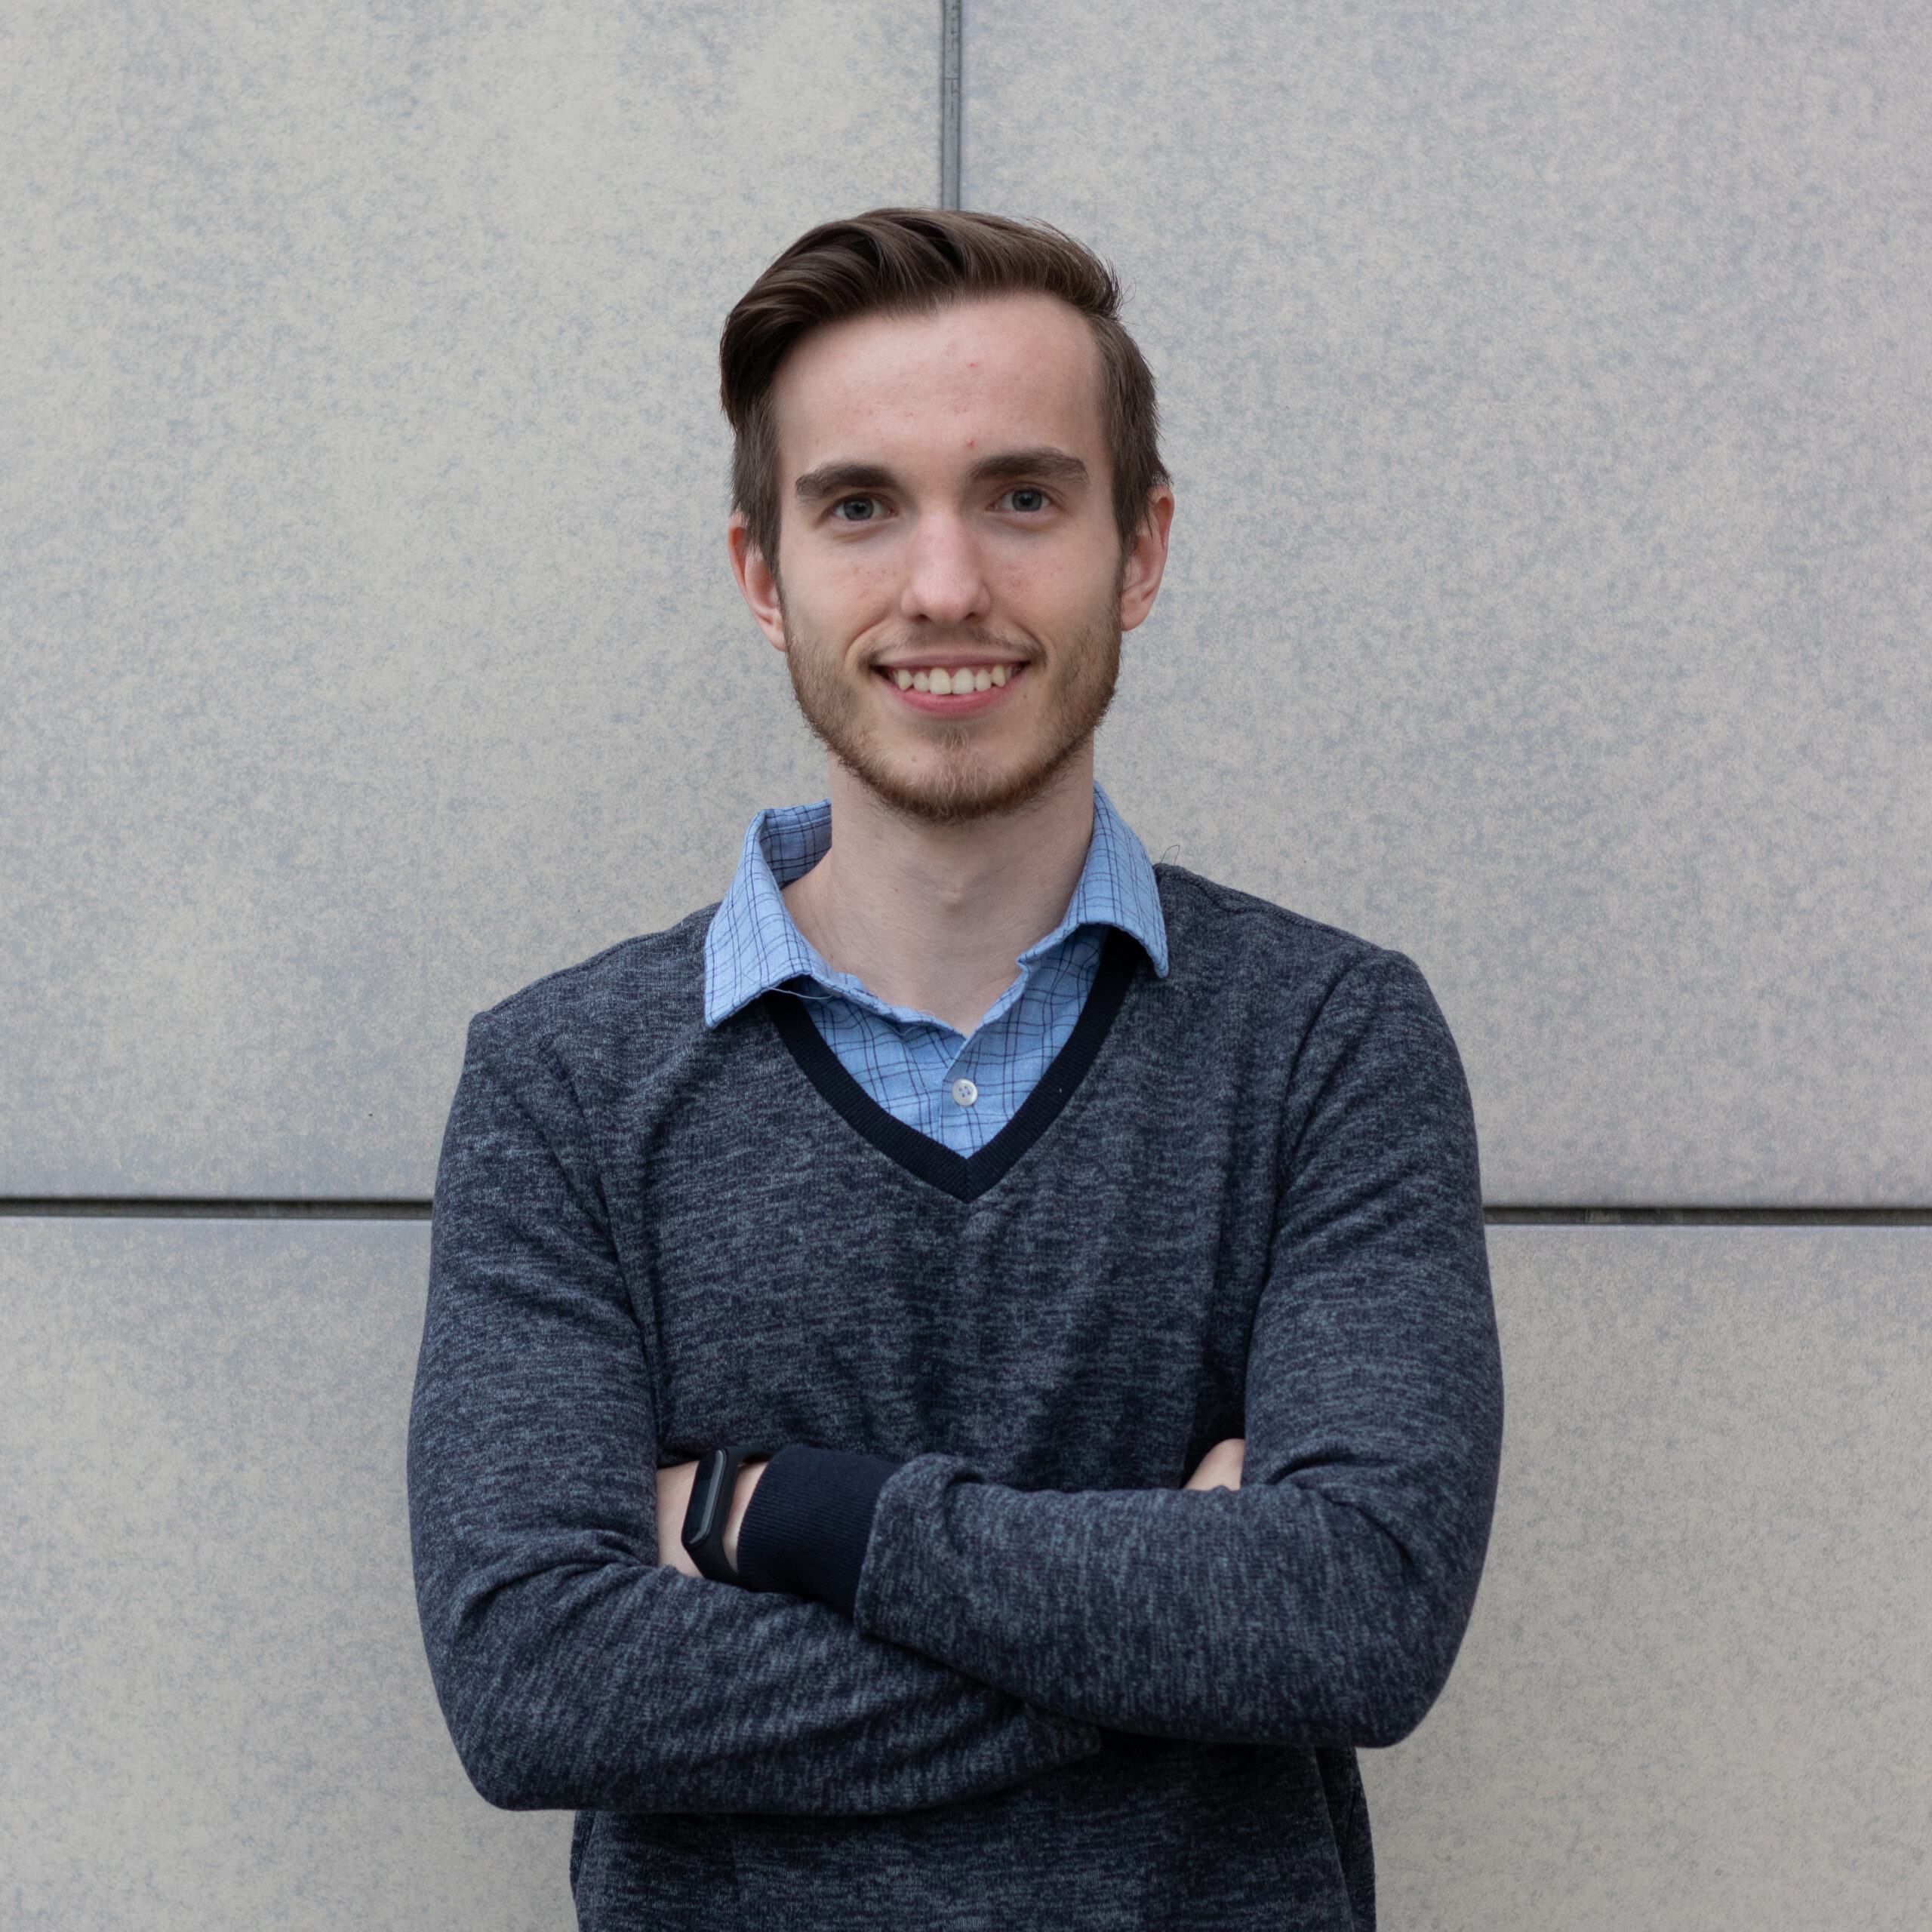 Aleksandar Gajić, Topic coordinator of Artificial Intelligence BattleGround 2021